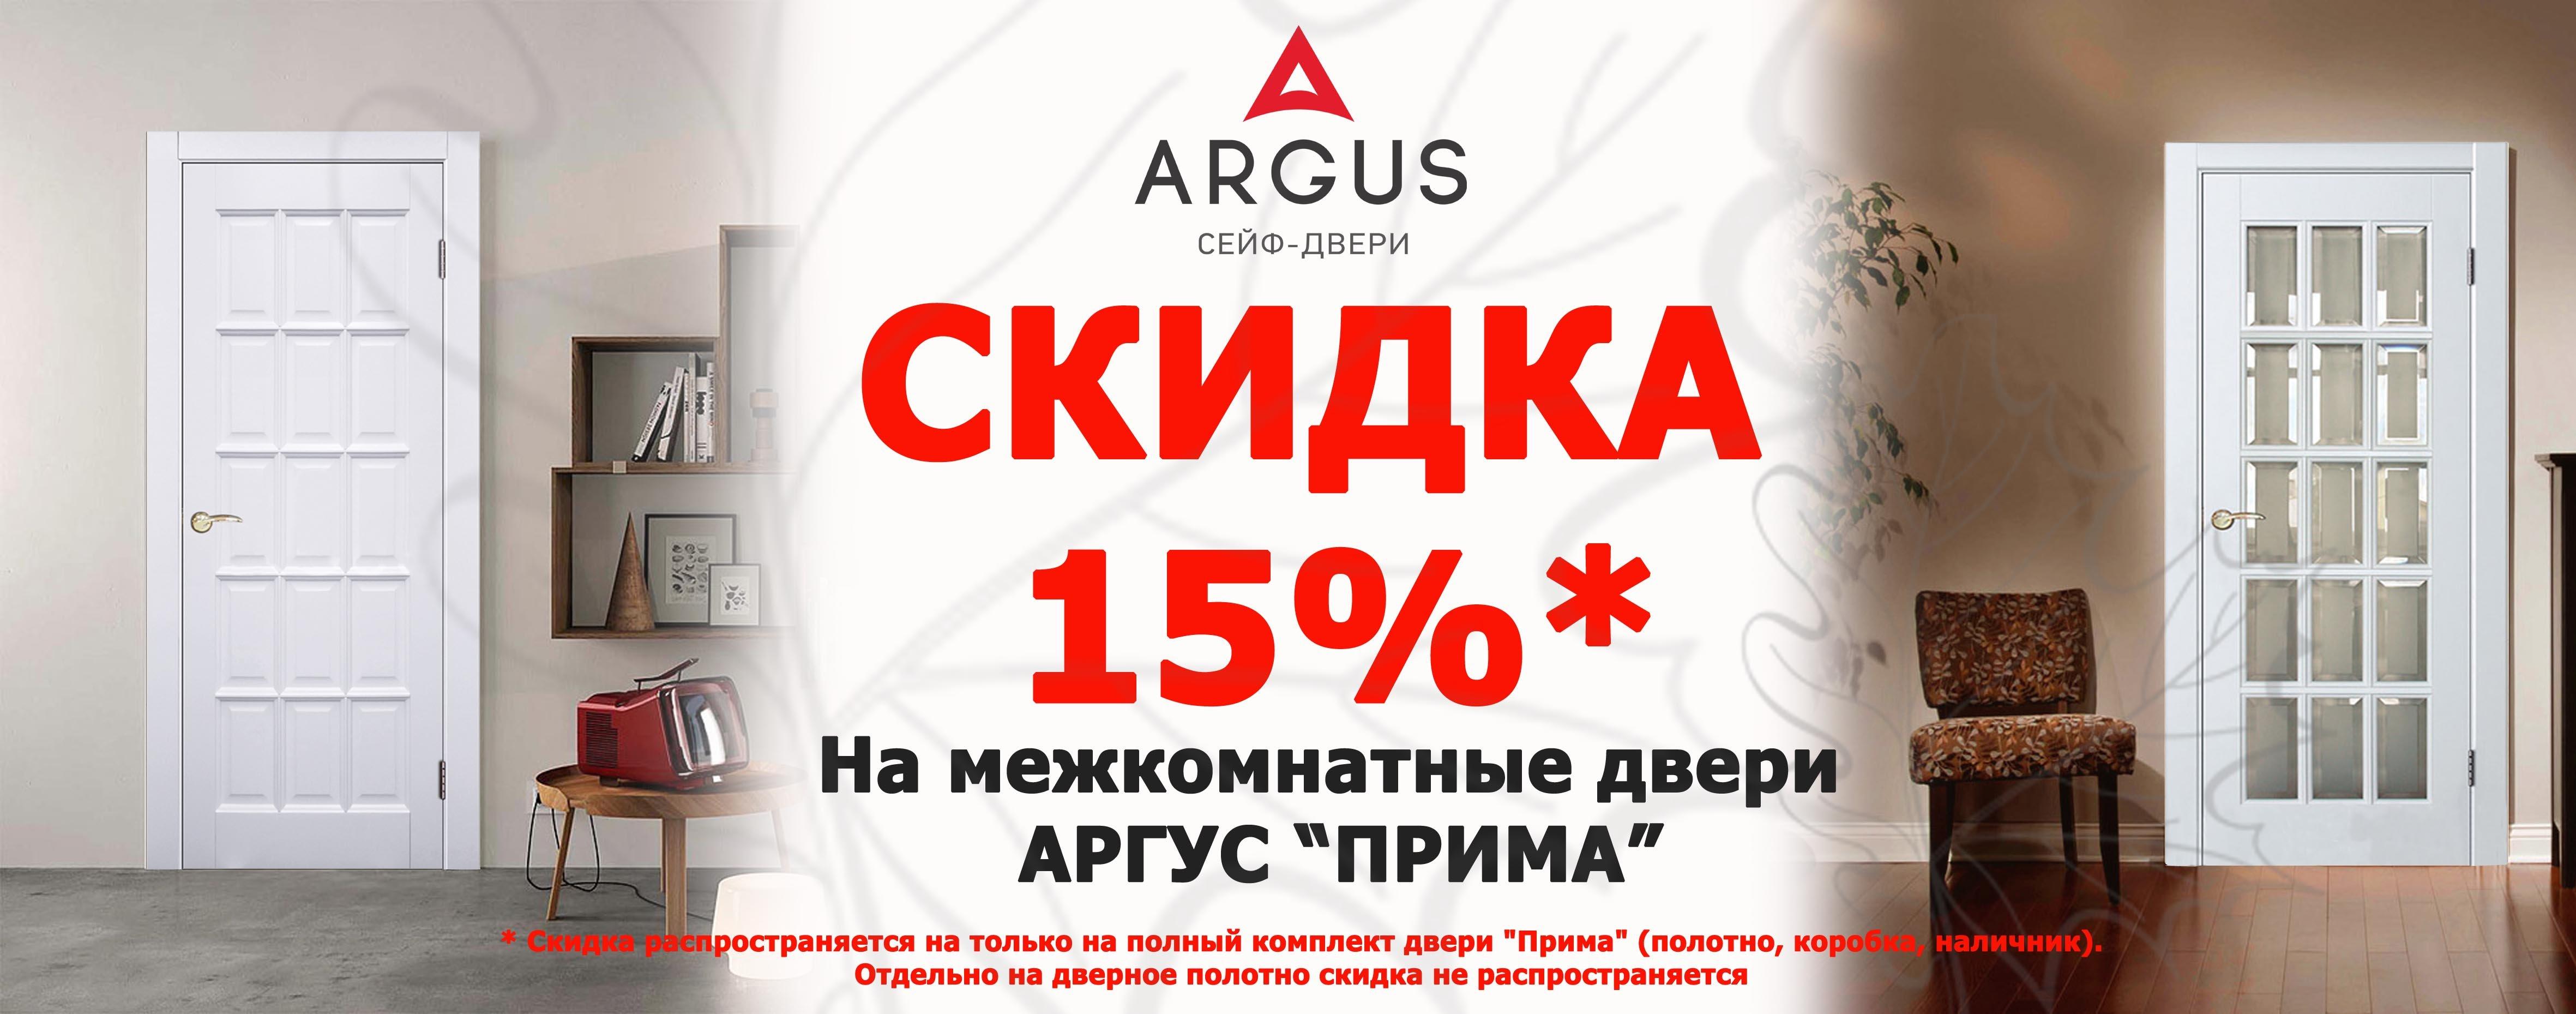 Скидка 15% на двери АРГУС ПРИМА